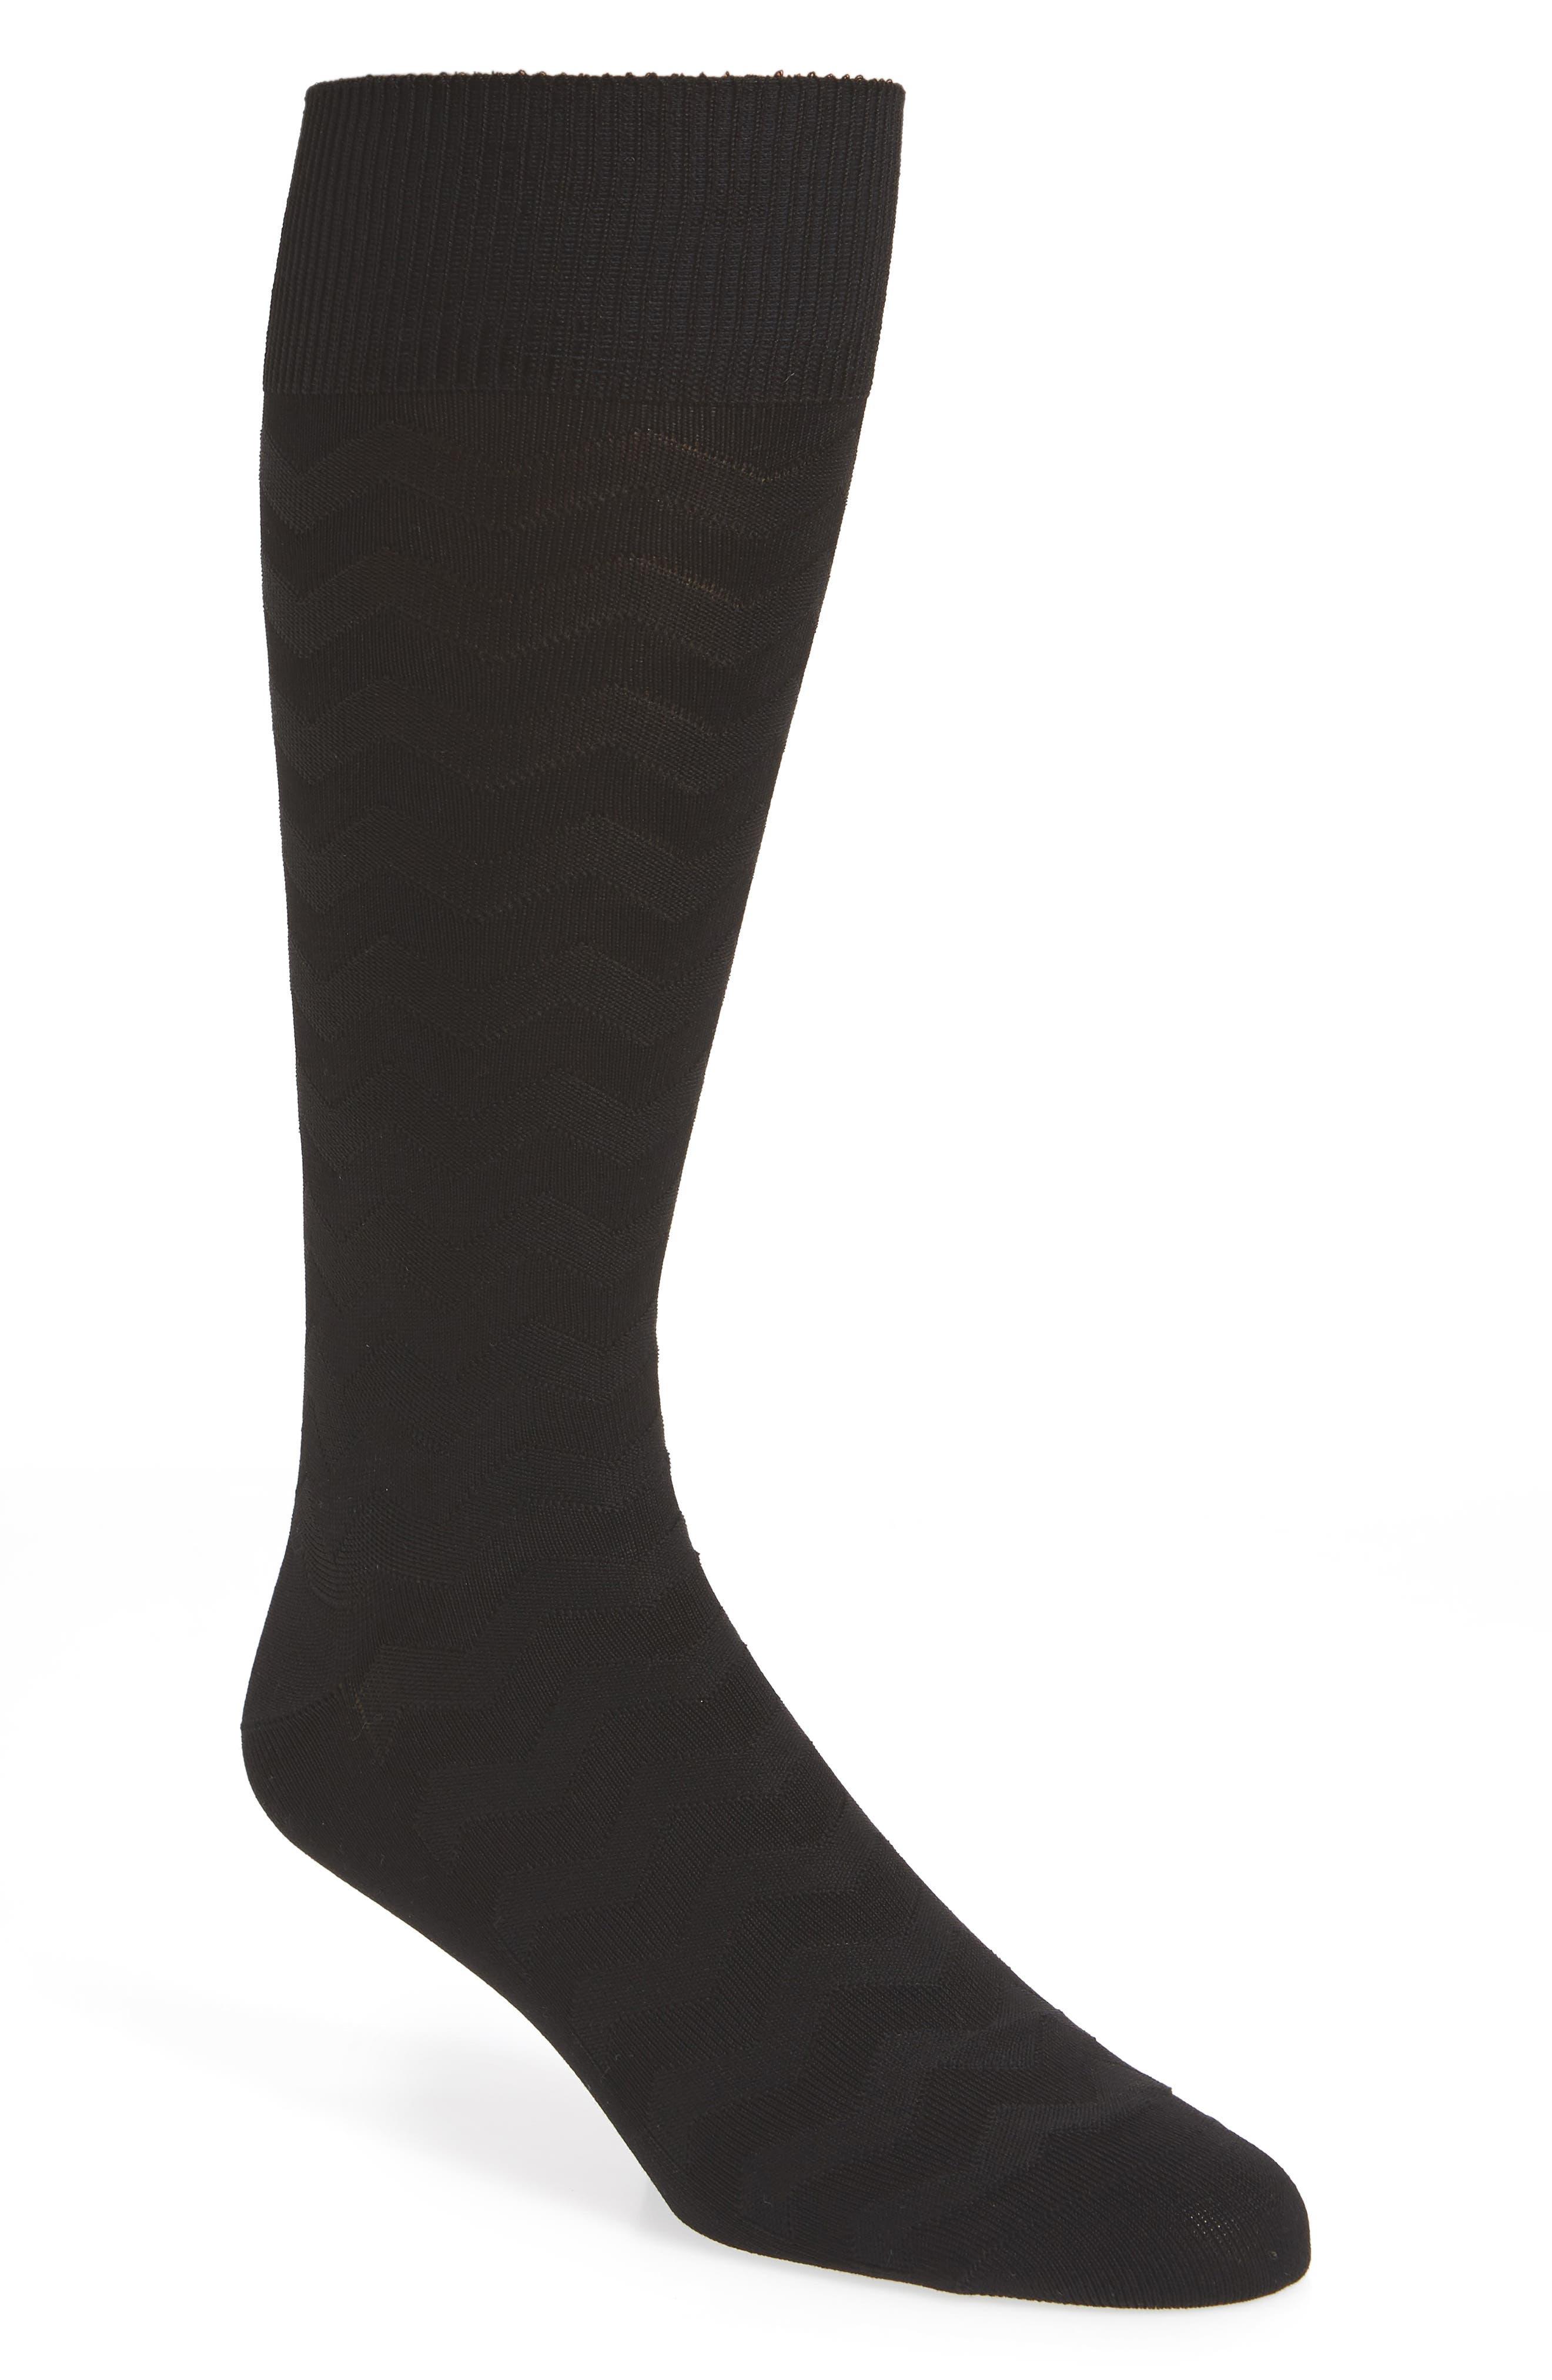 Zigzag Socks,                             Main thumbnail 1, color,                             Black